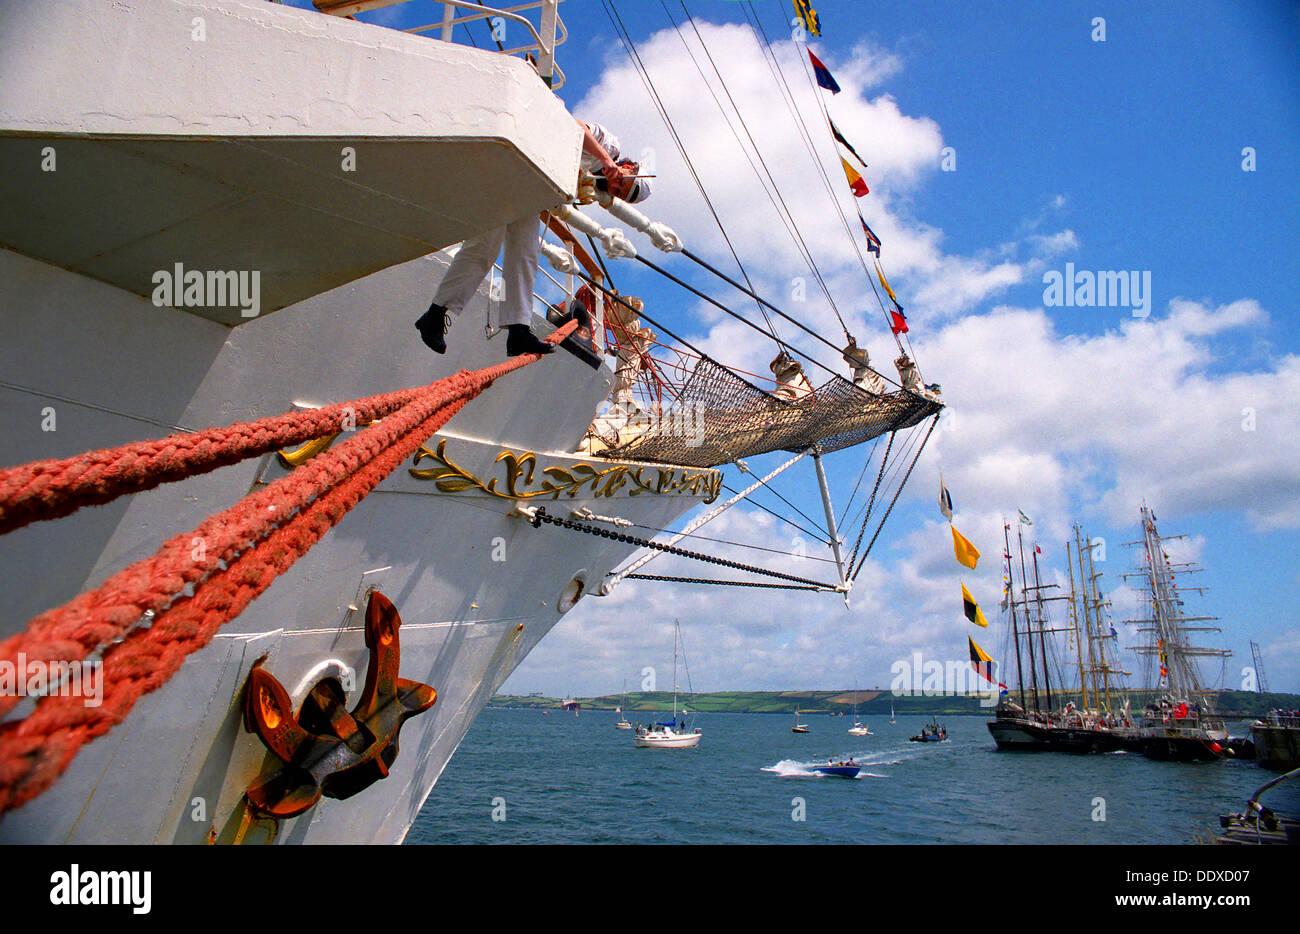 Tall Ship's race preparations, Falmouth, Cornwall. 1998 - Stock Image